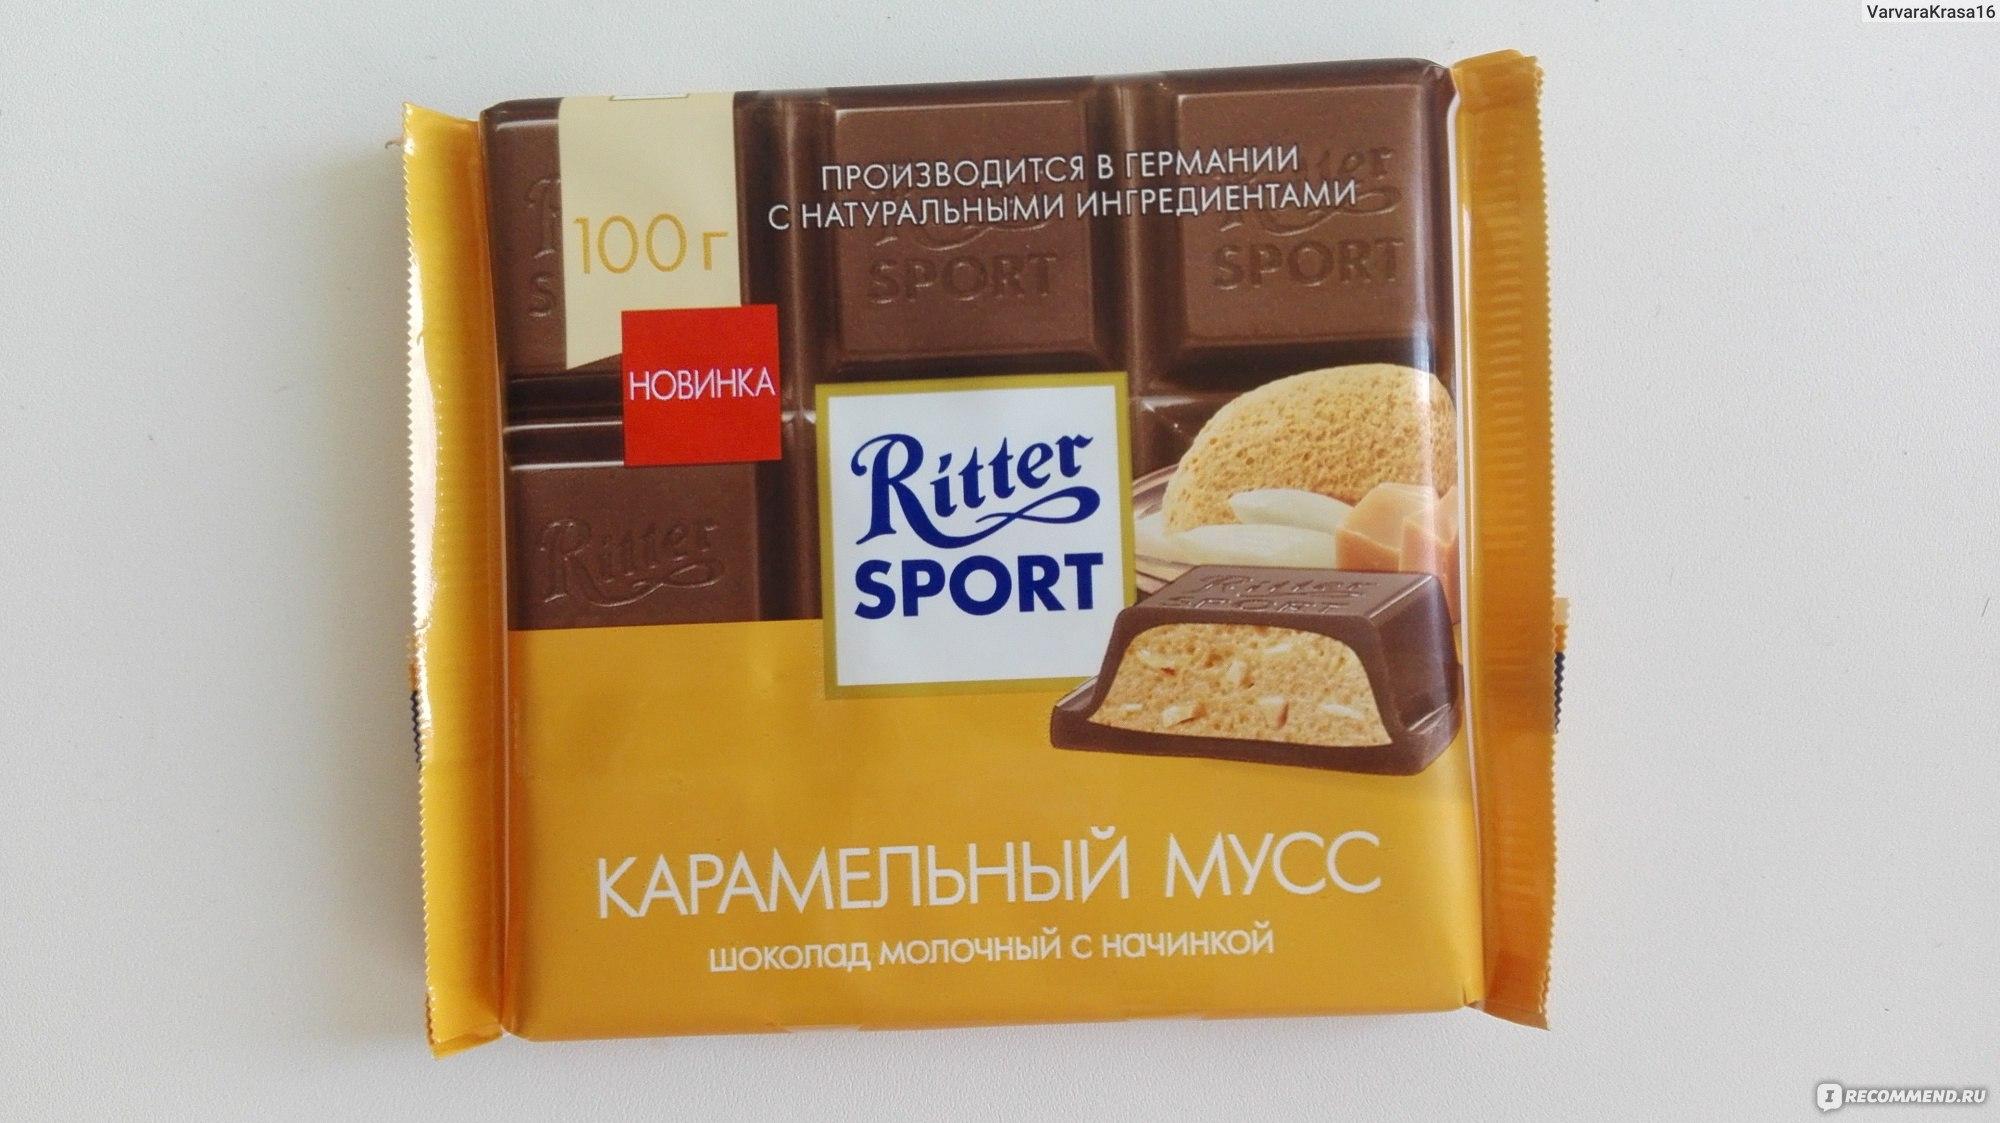 Ritter sport все вкусы фото